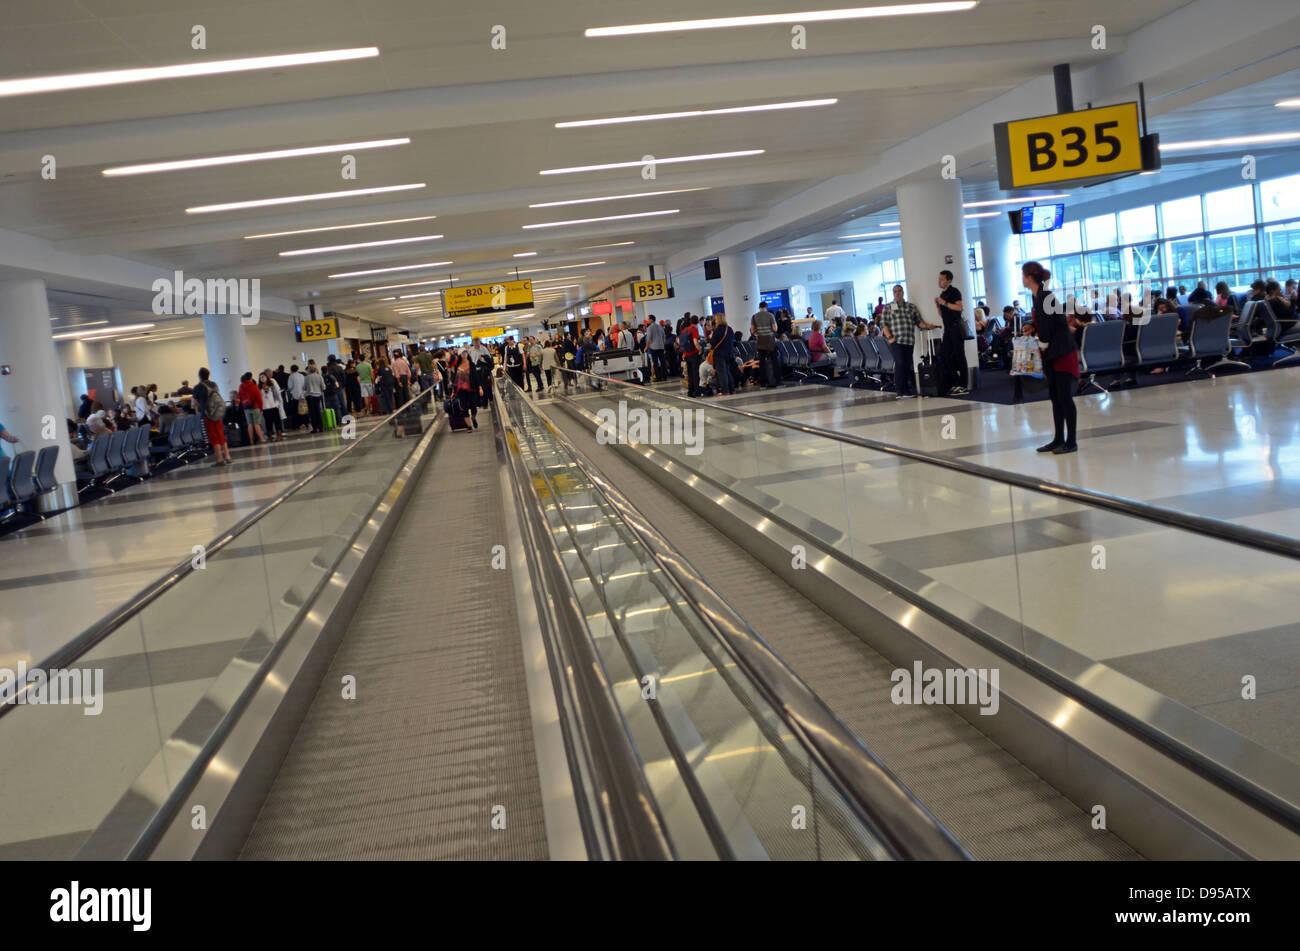 Aeroporto Jfk : Partidas no terminal 4 do aeroporto jfk nova iorque foto imagem de